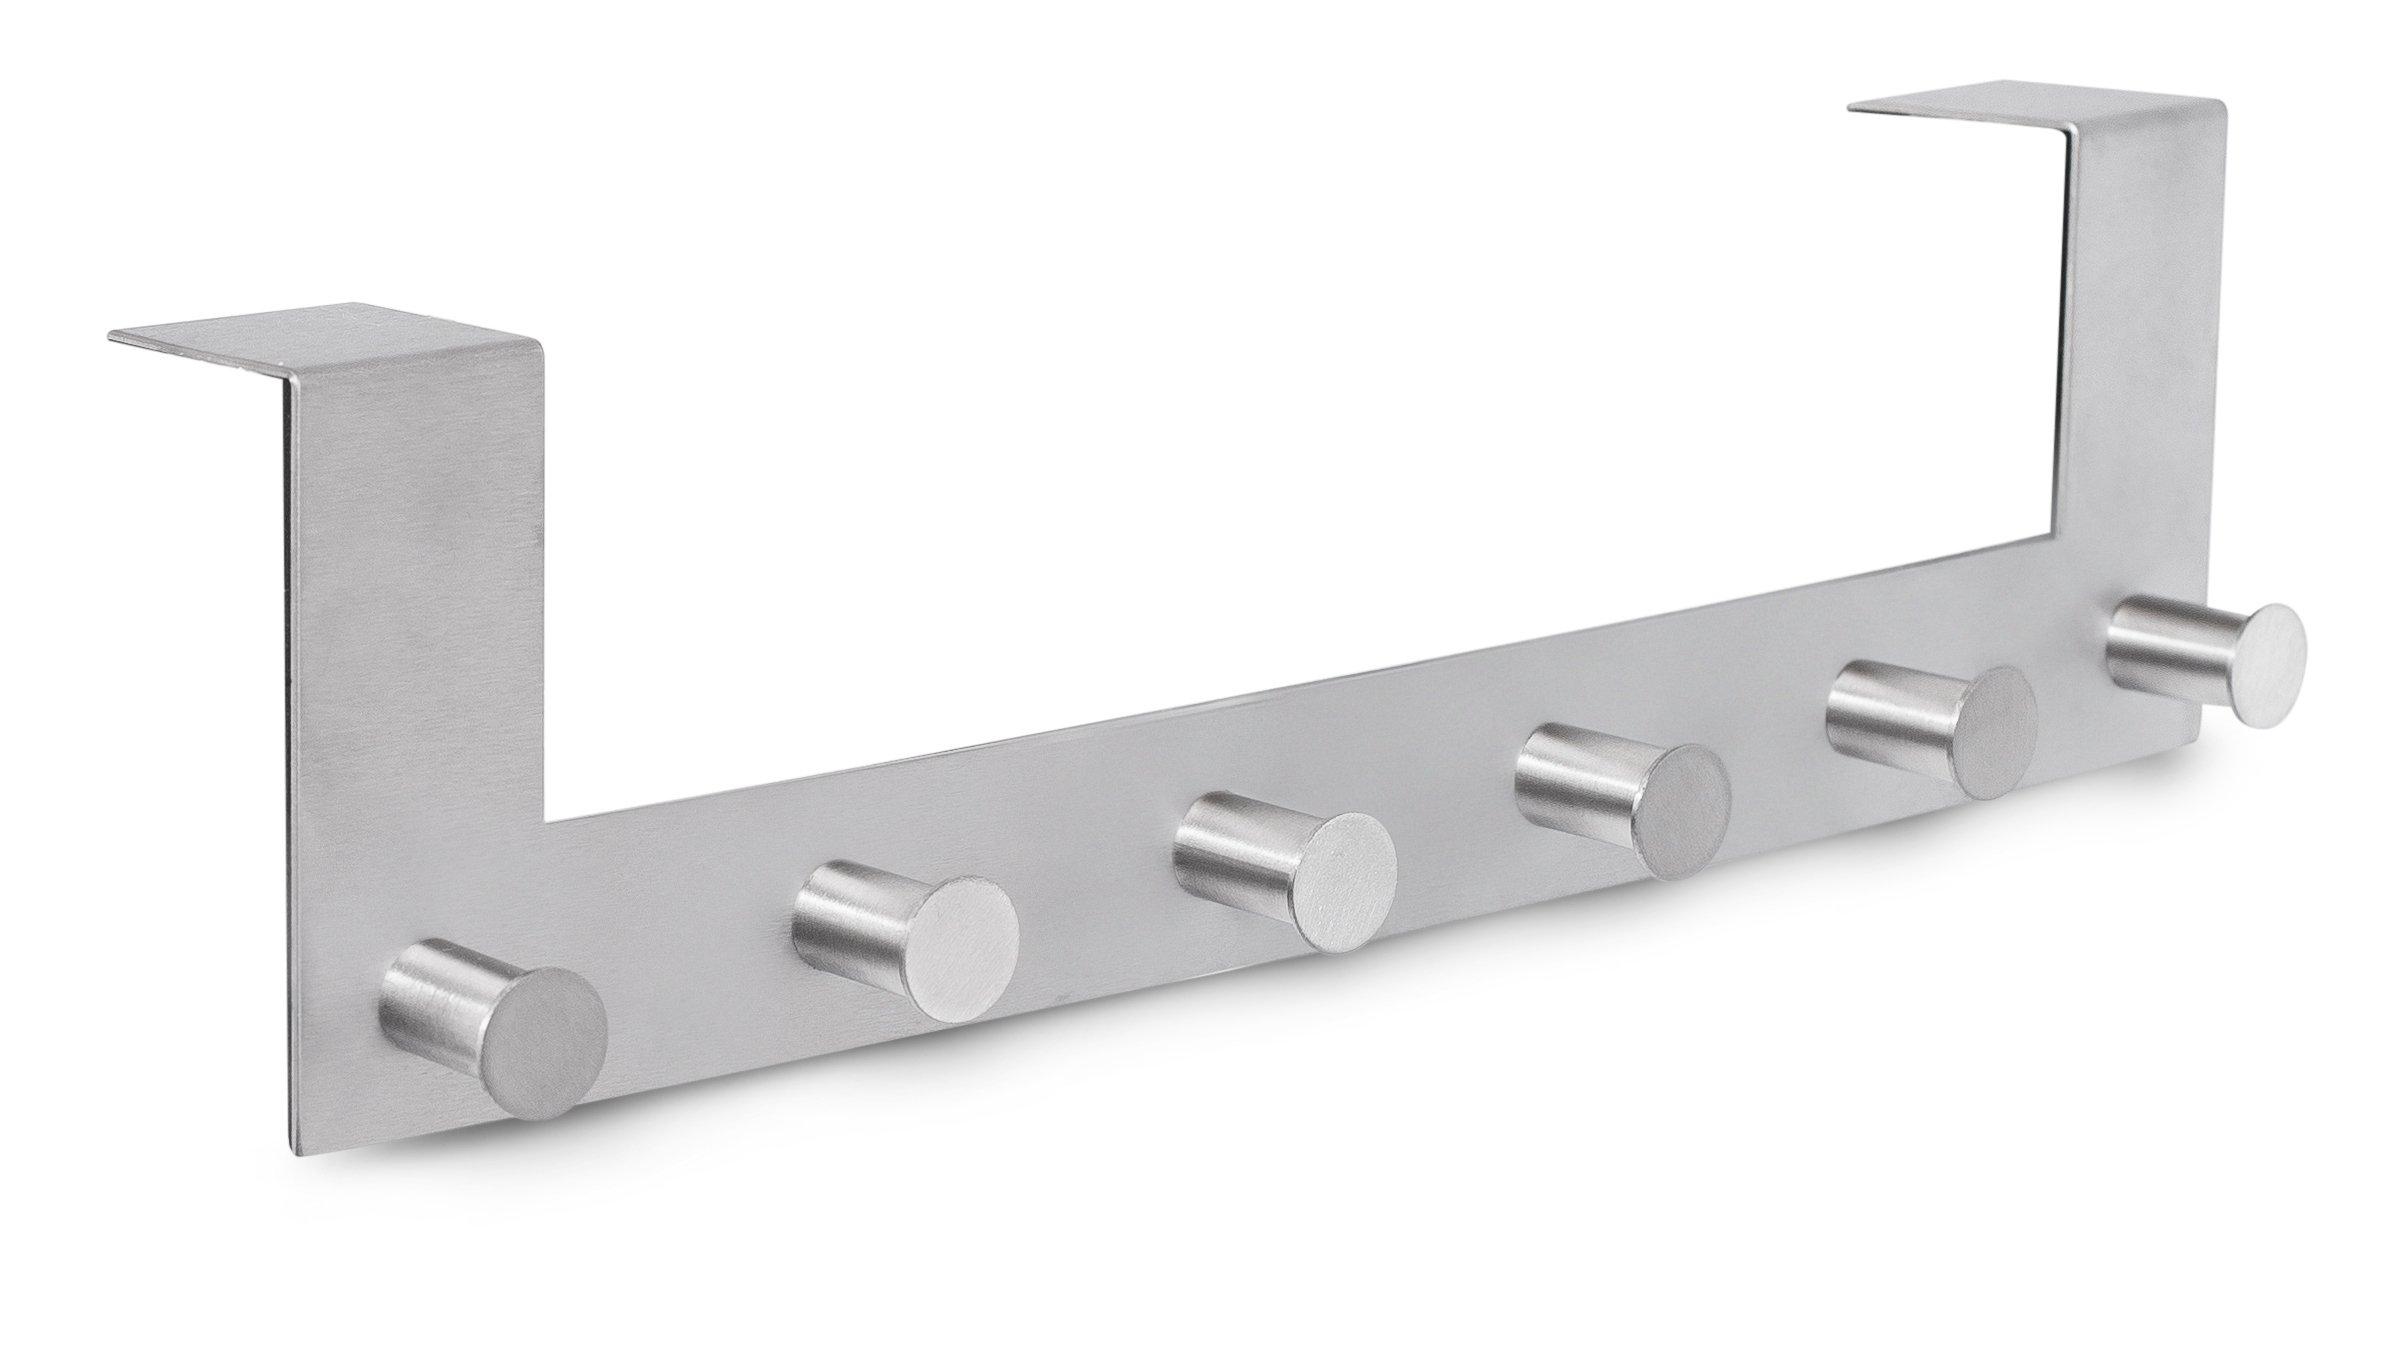 Internet's Best Over the Door Contemporary Hook Rack | 6 Hooks | Stainless Steel Hanging Hook Rail | Bathroom Towel Rail | Outdoor or Indoor